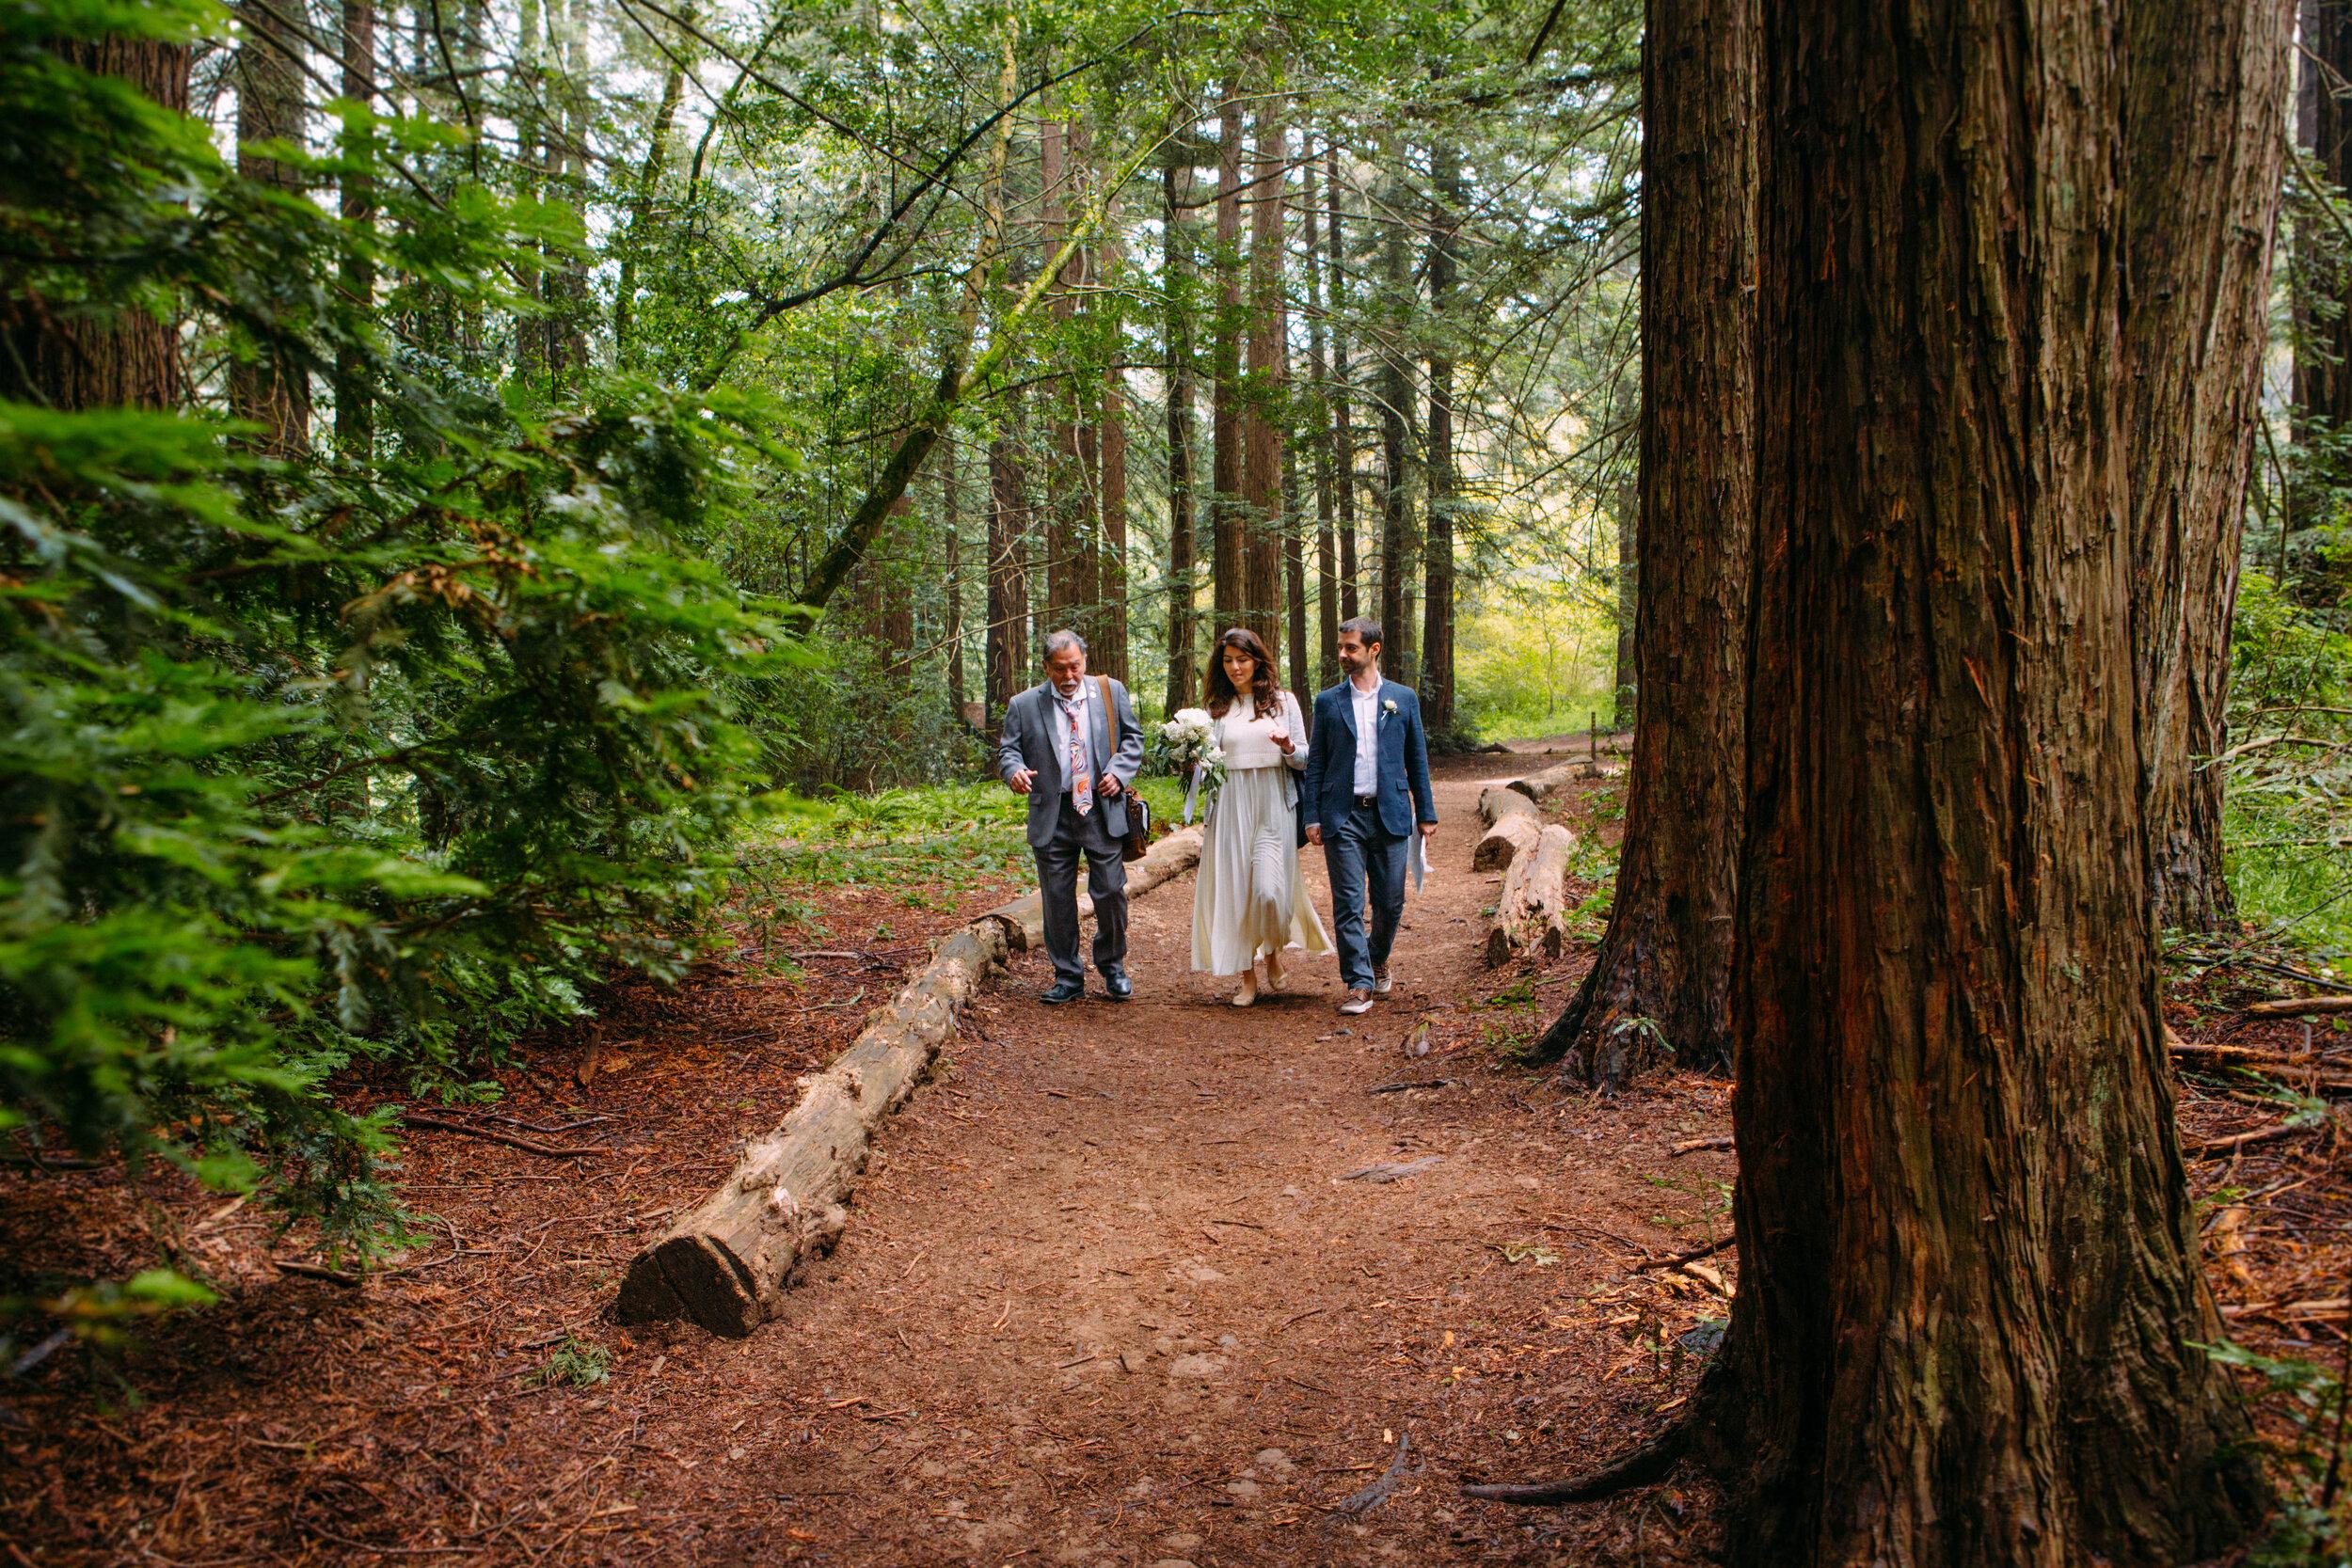 20190716-San Francisco-Redwood Regional Park-Marcella Daniele--3.jpg